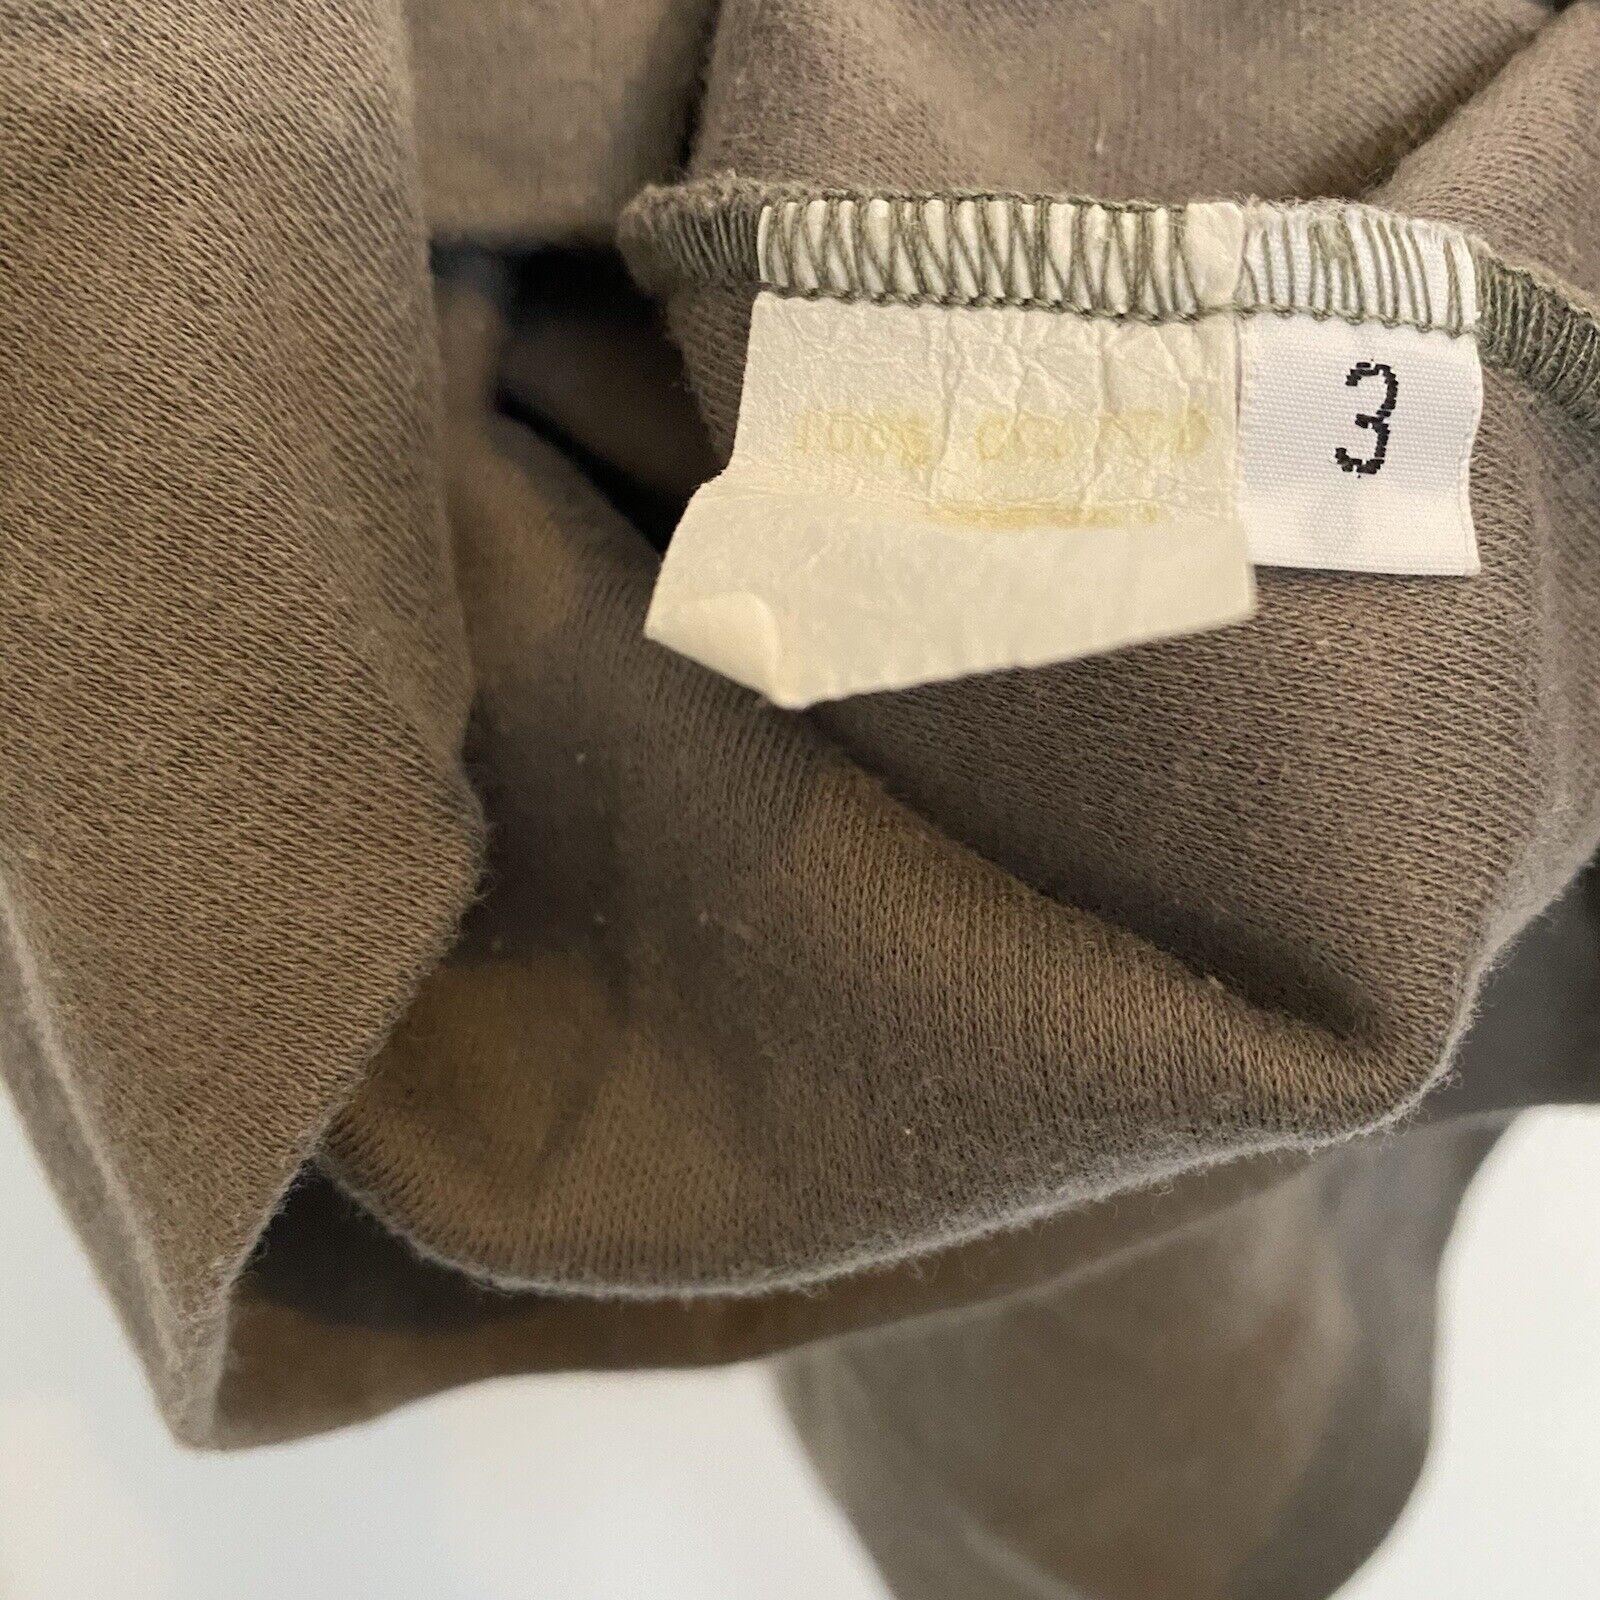 Vtg 80s 90s Ralph Lauren Turtleneck Sweater Cente… - image 4